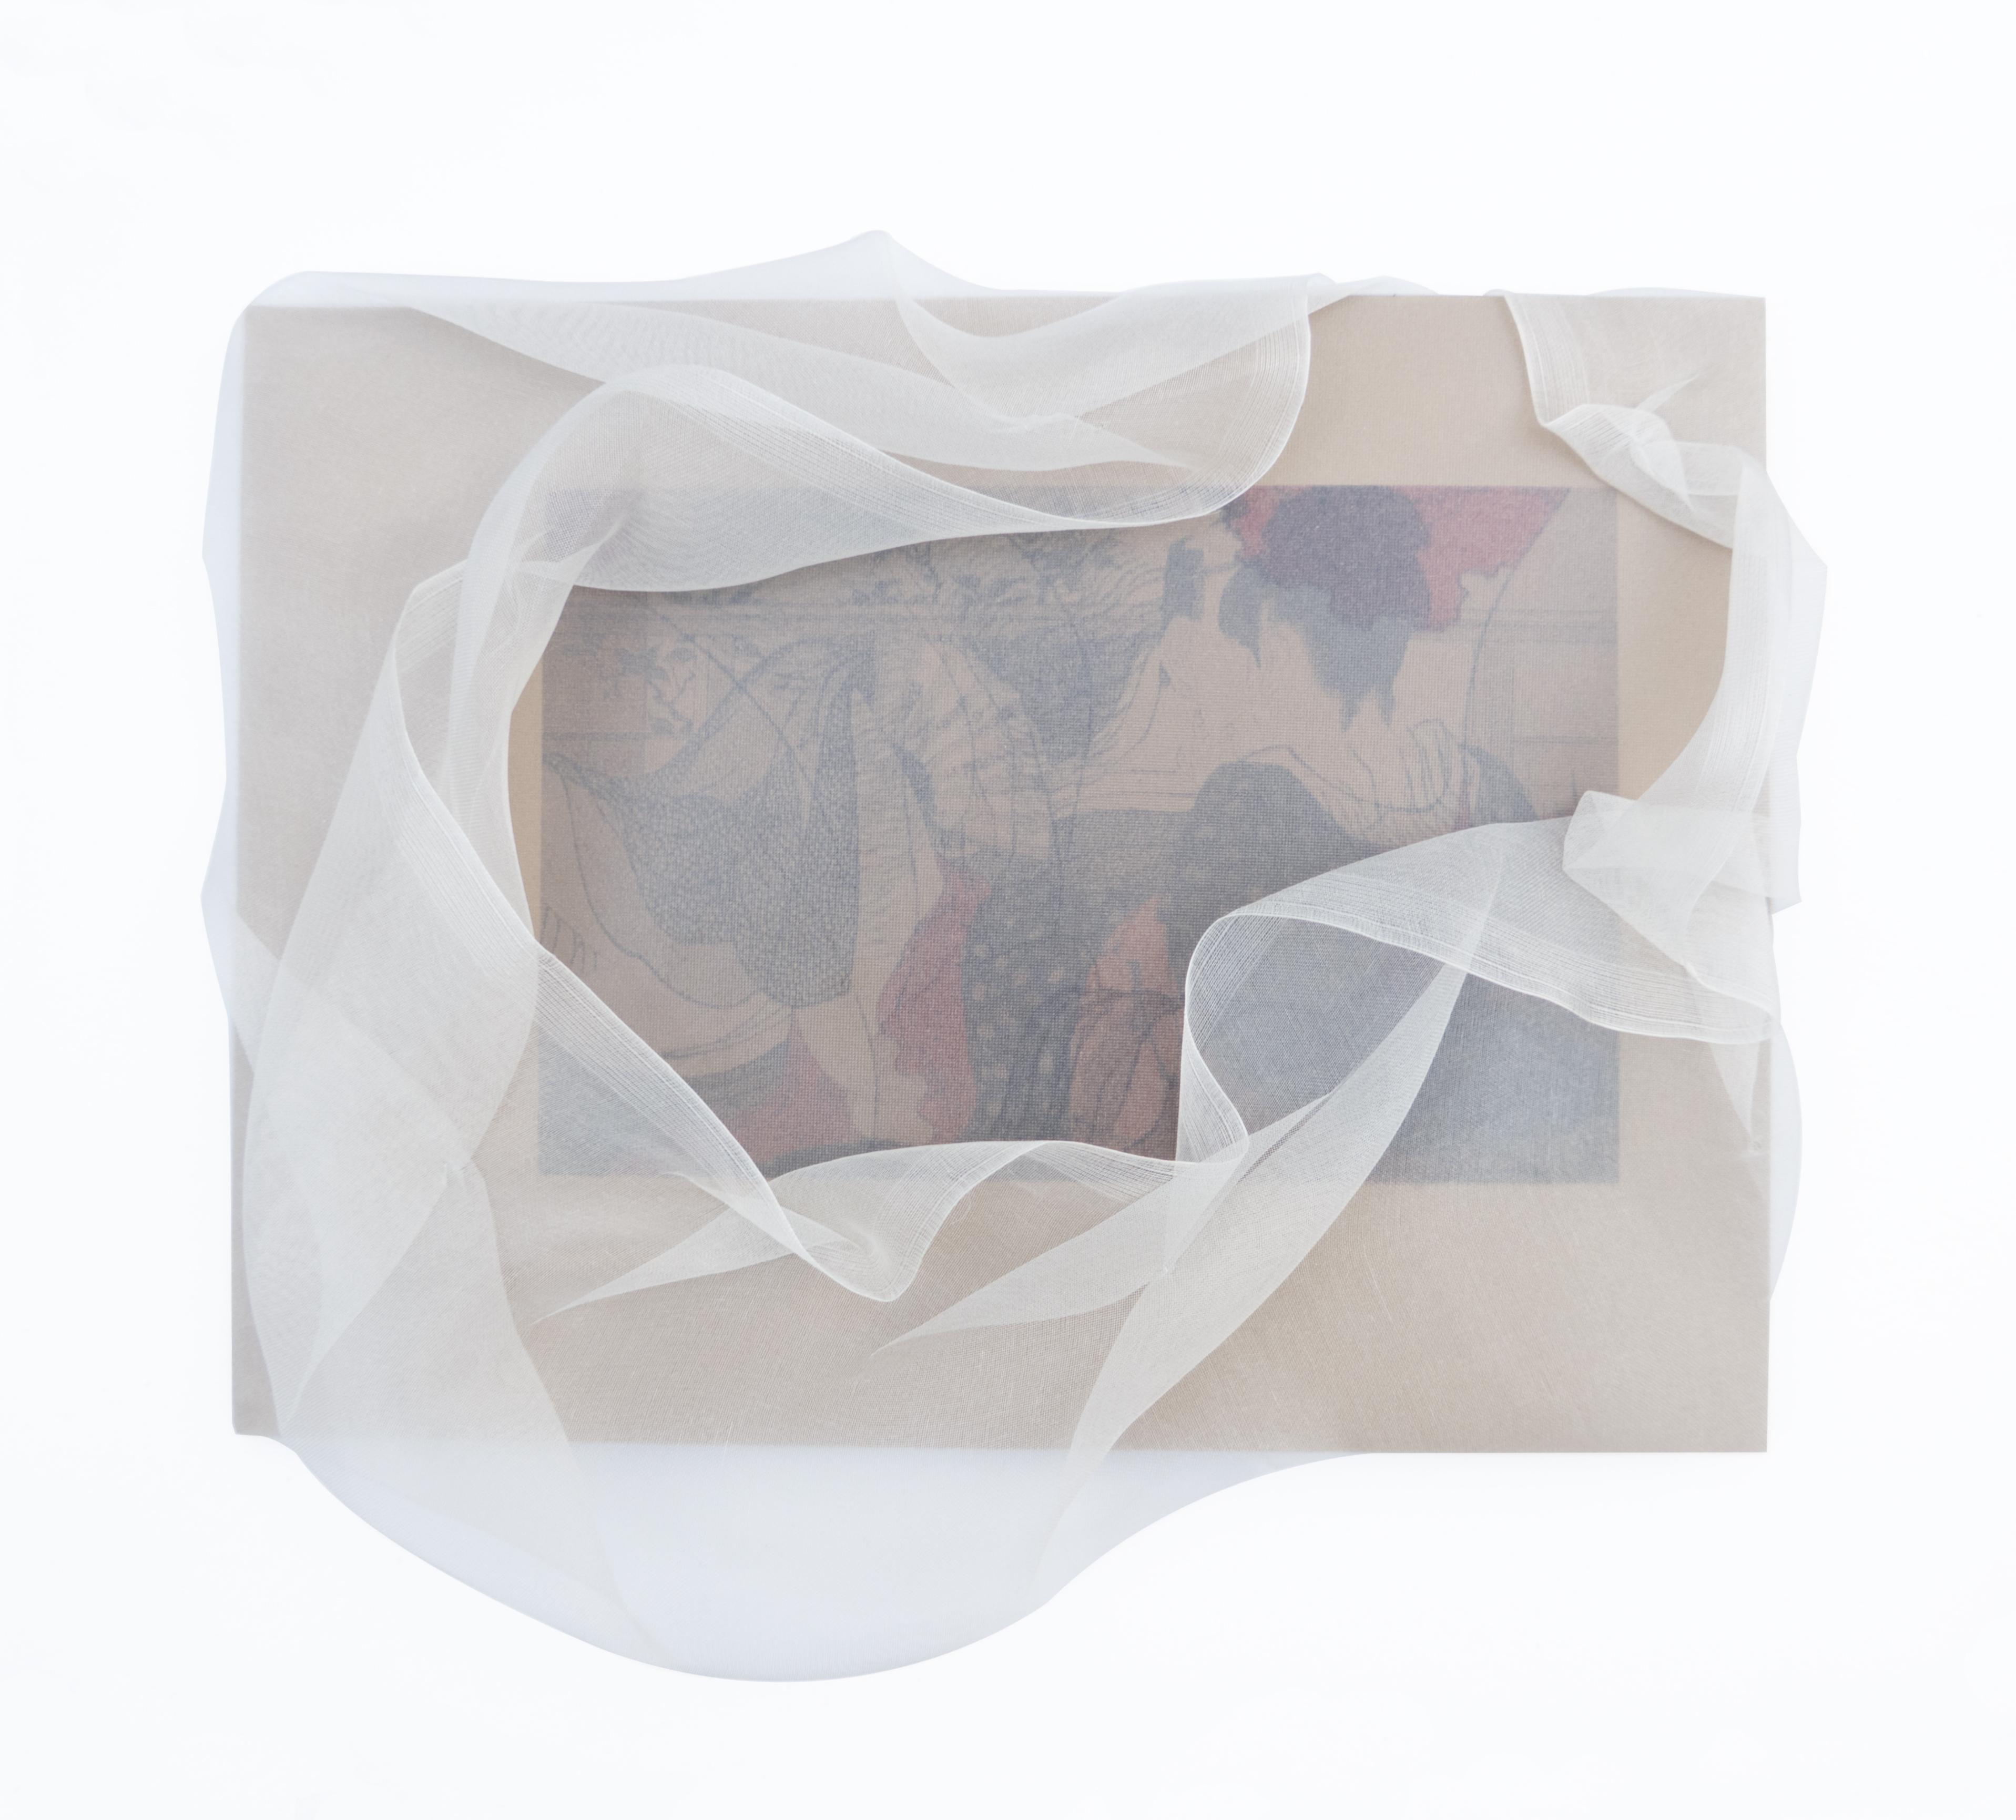 Kaori Juzu, Inbetween #1, 2016 Steel, textile, silk, plastic, magnet